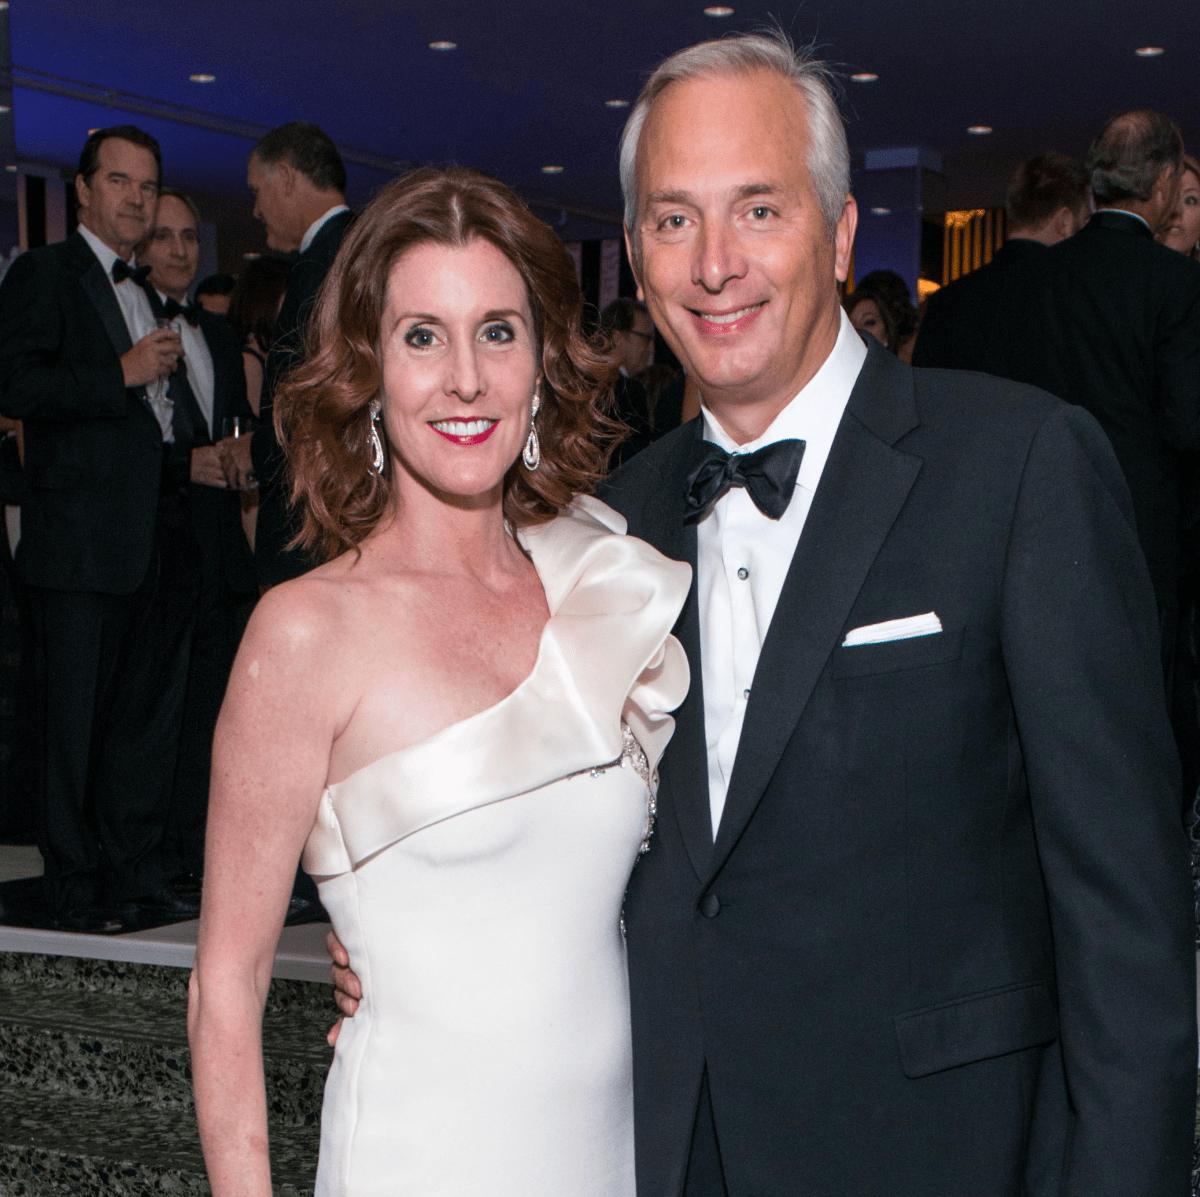 News, Shelby, Museum of Fine Arts gala, Oct. 2015, Bobby Tudor, Phoebe Tudor